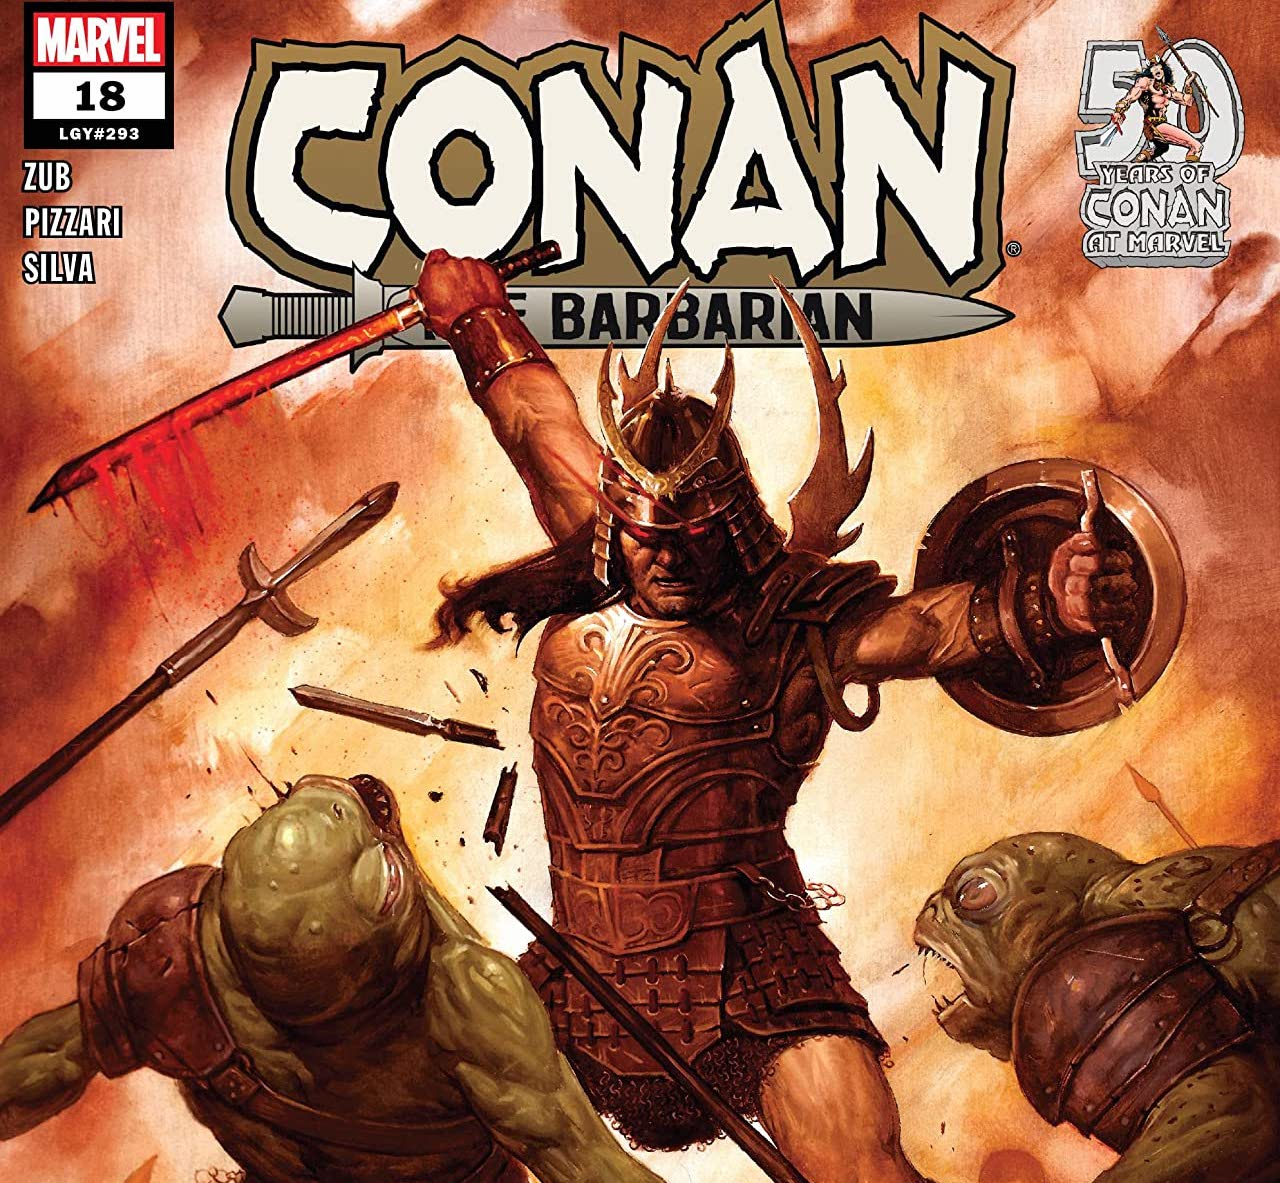 'Conan The Barbarian' #18 review